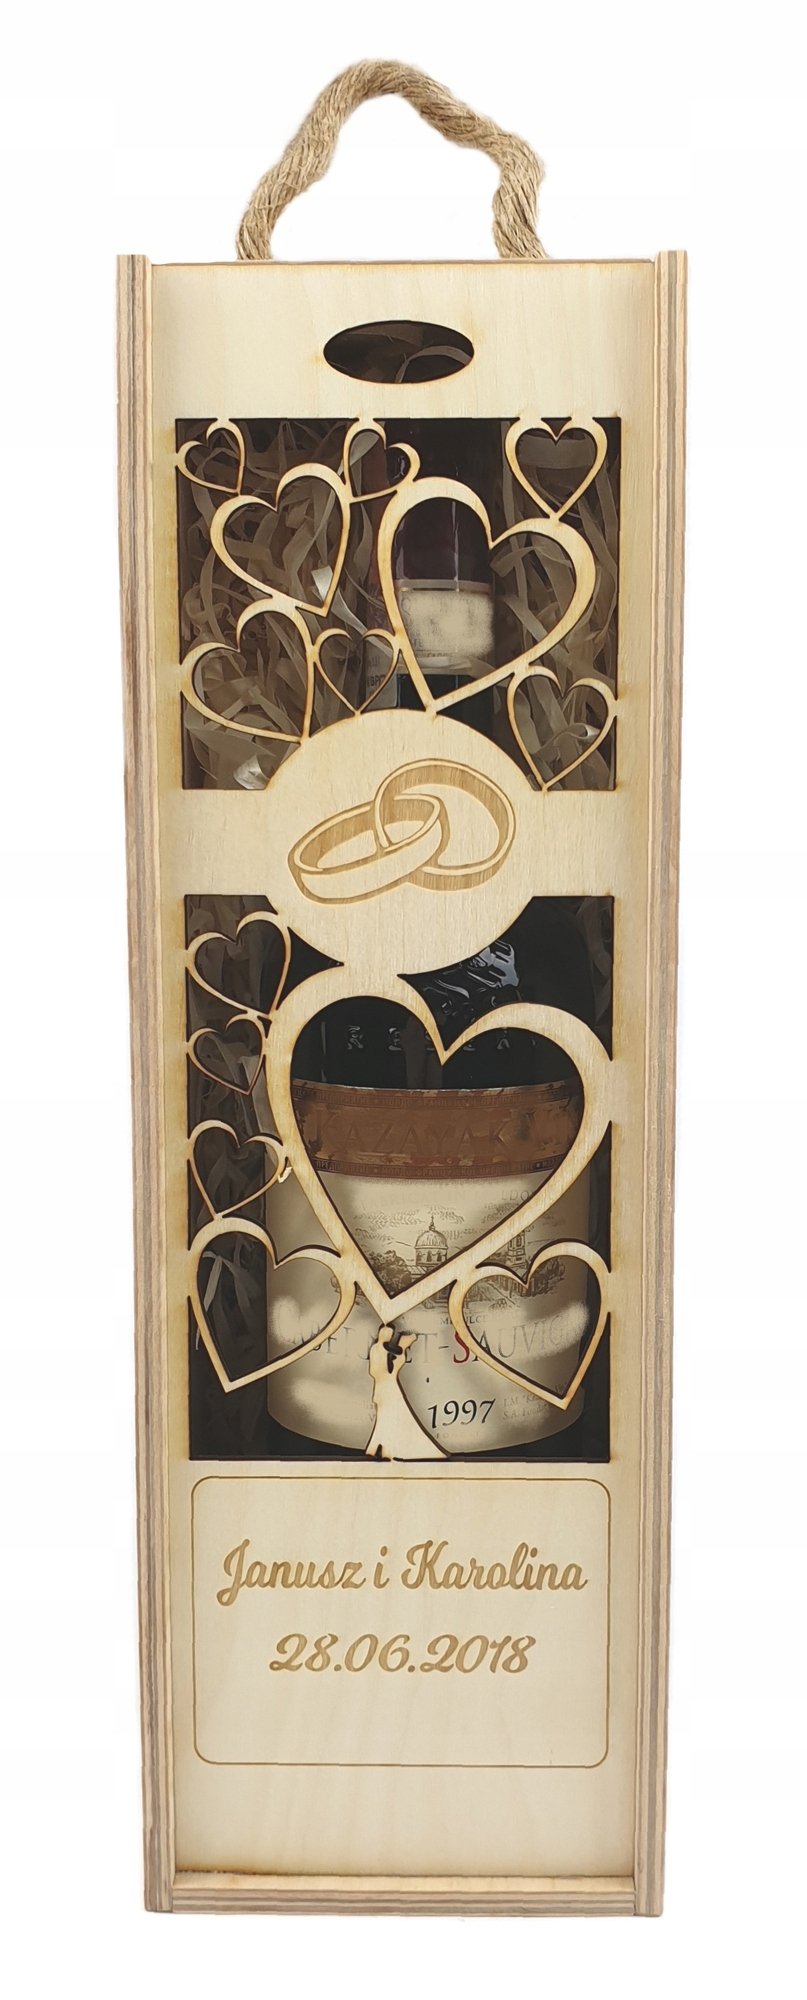 Деревянная коробка для вина. Подарочная коробка. Гравировка.